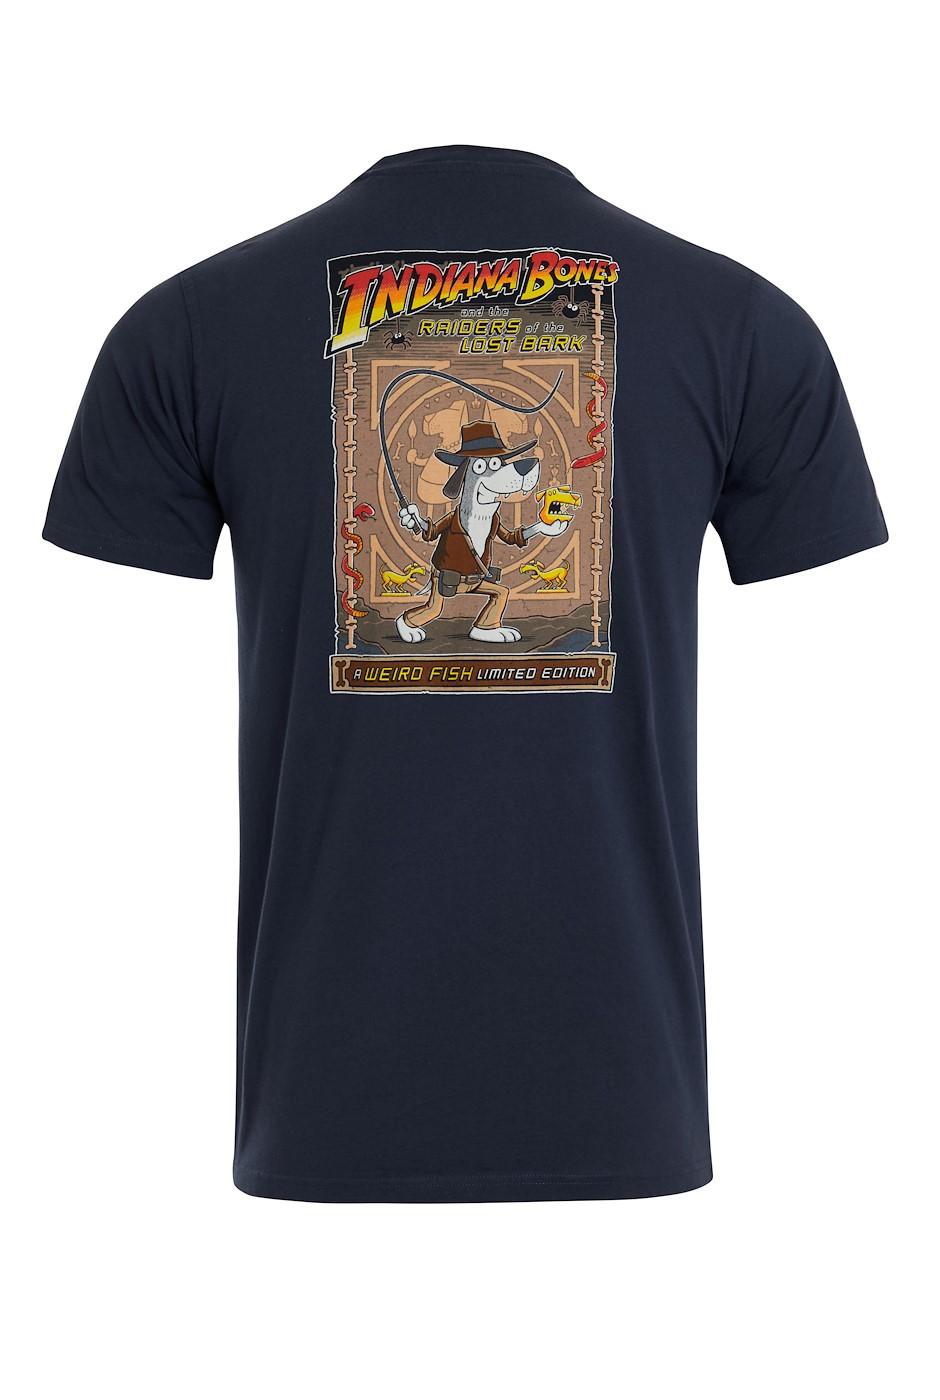 Indiana Bones Battersea Organic Cotton Artist T-Shirt Navy